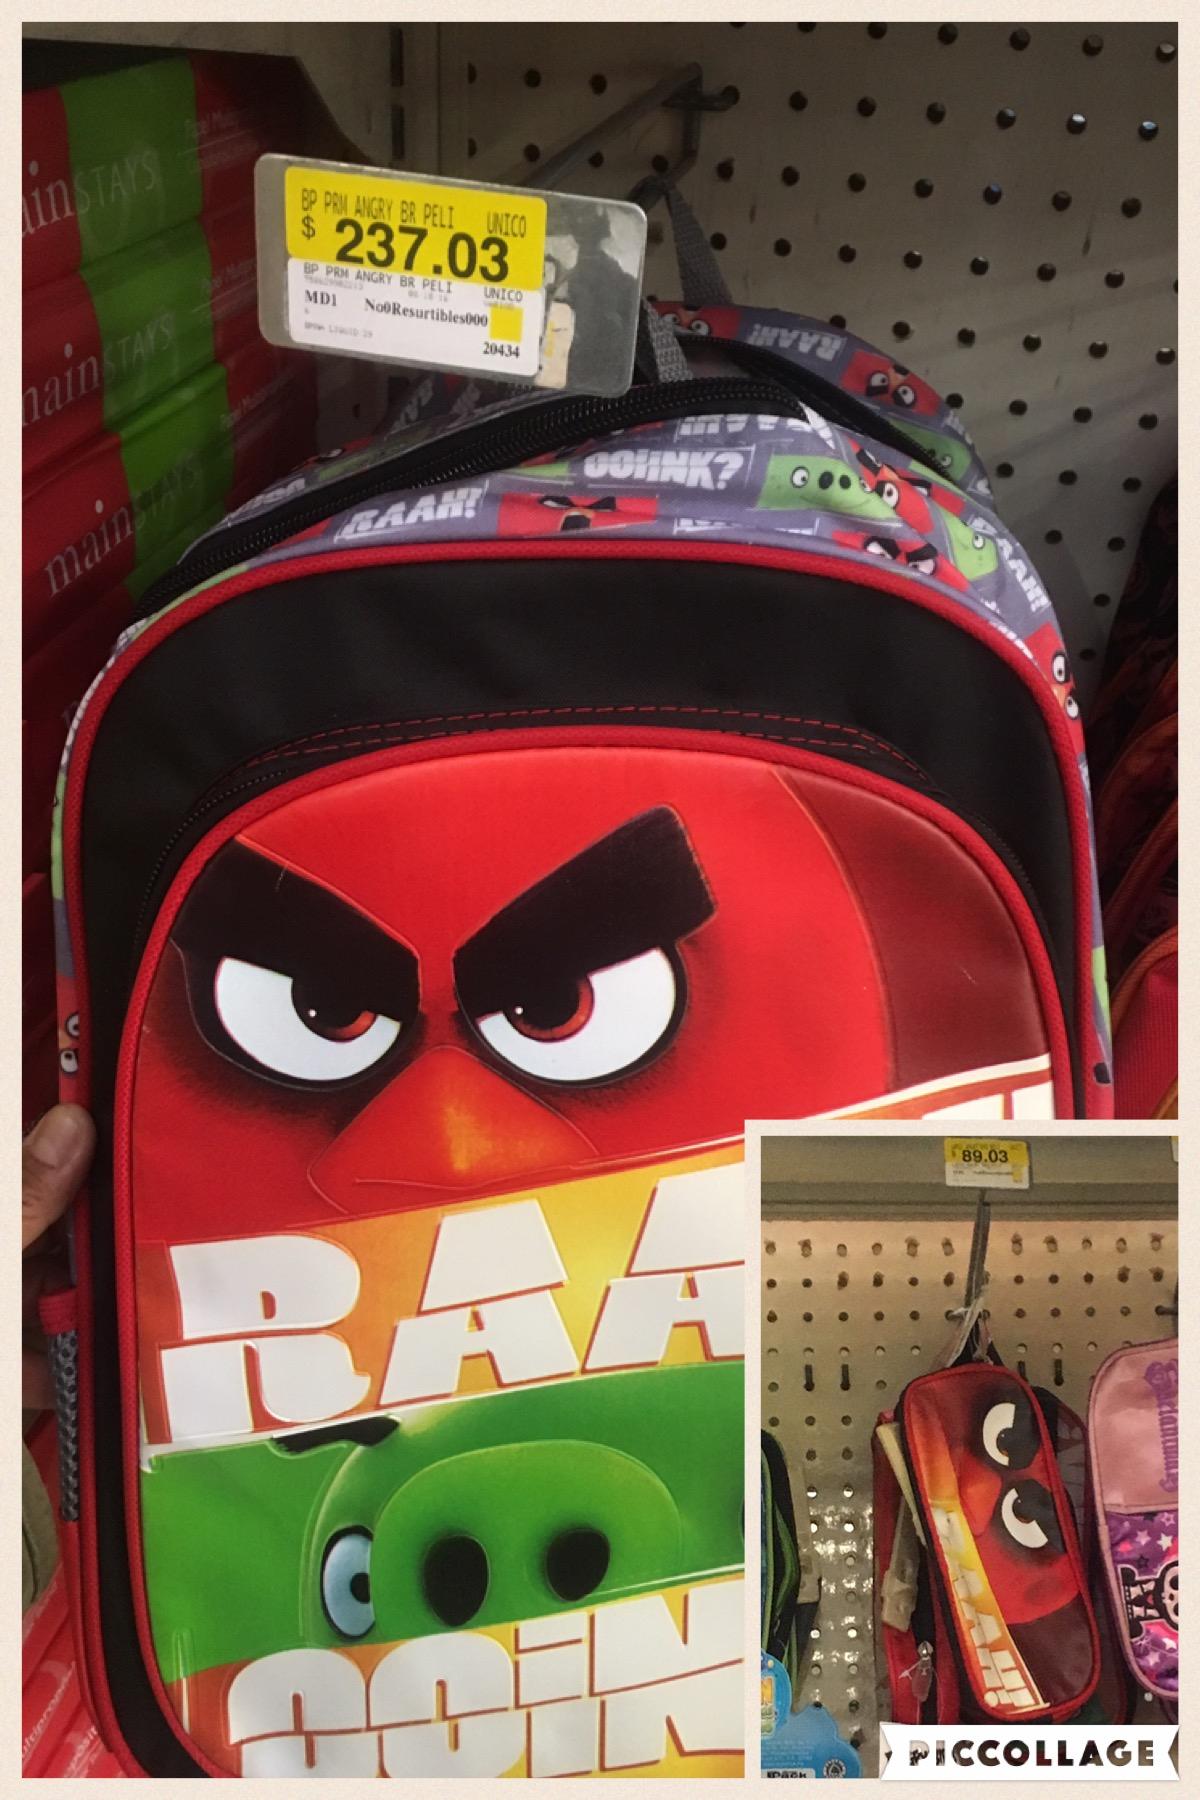 Walmart: liquidación mochila angry birds a $237.03